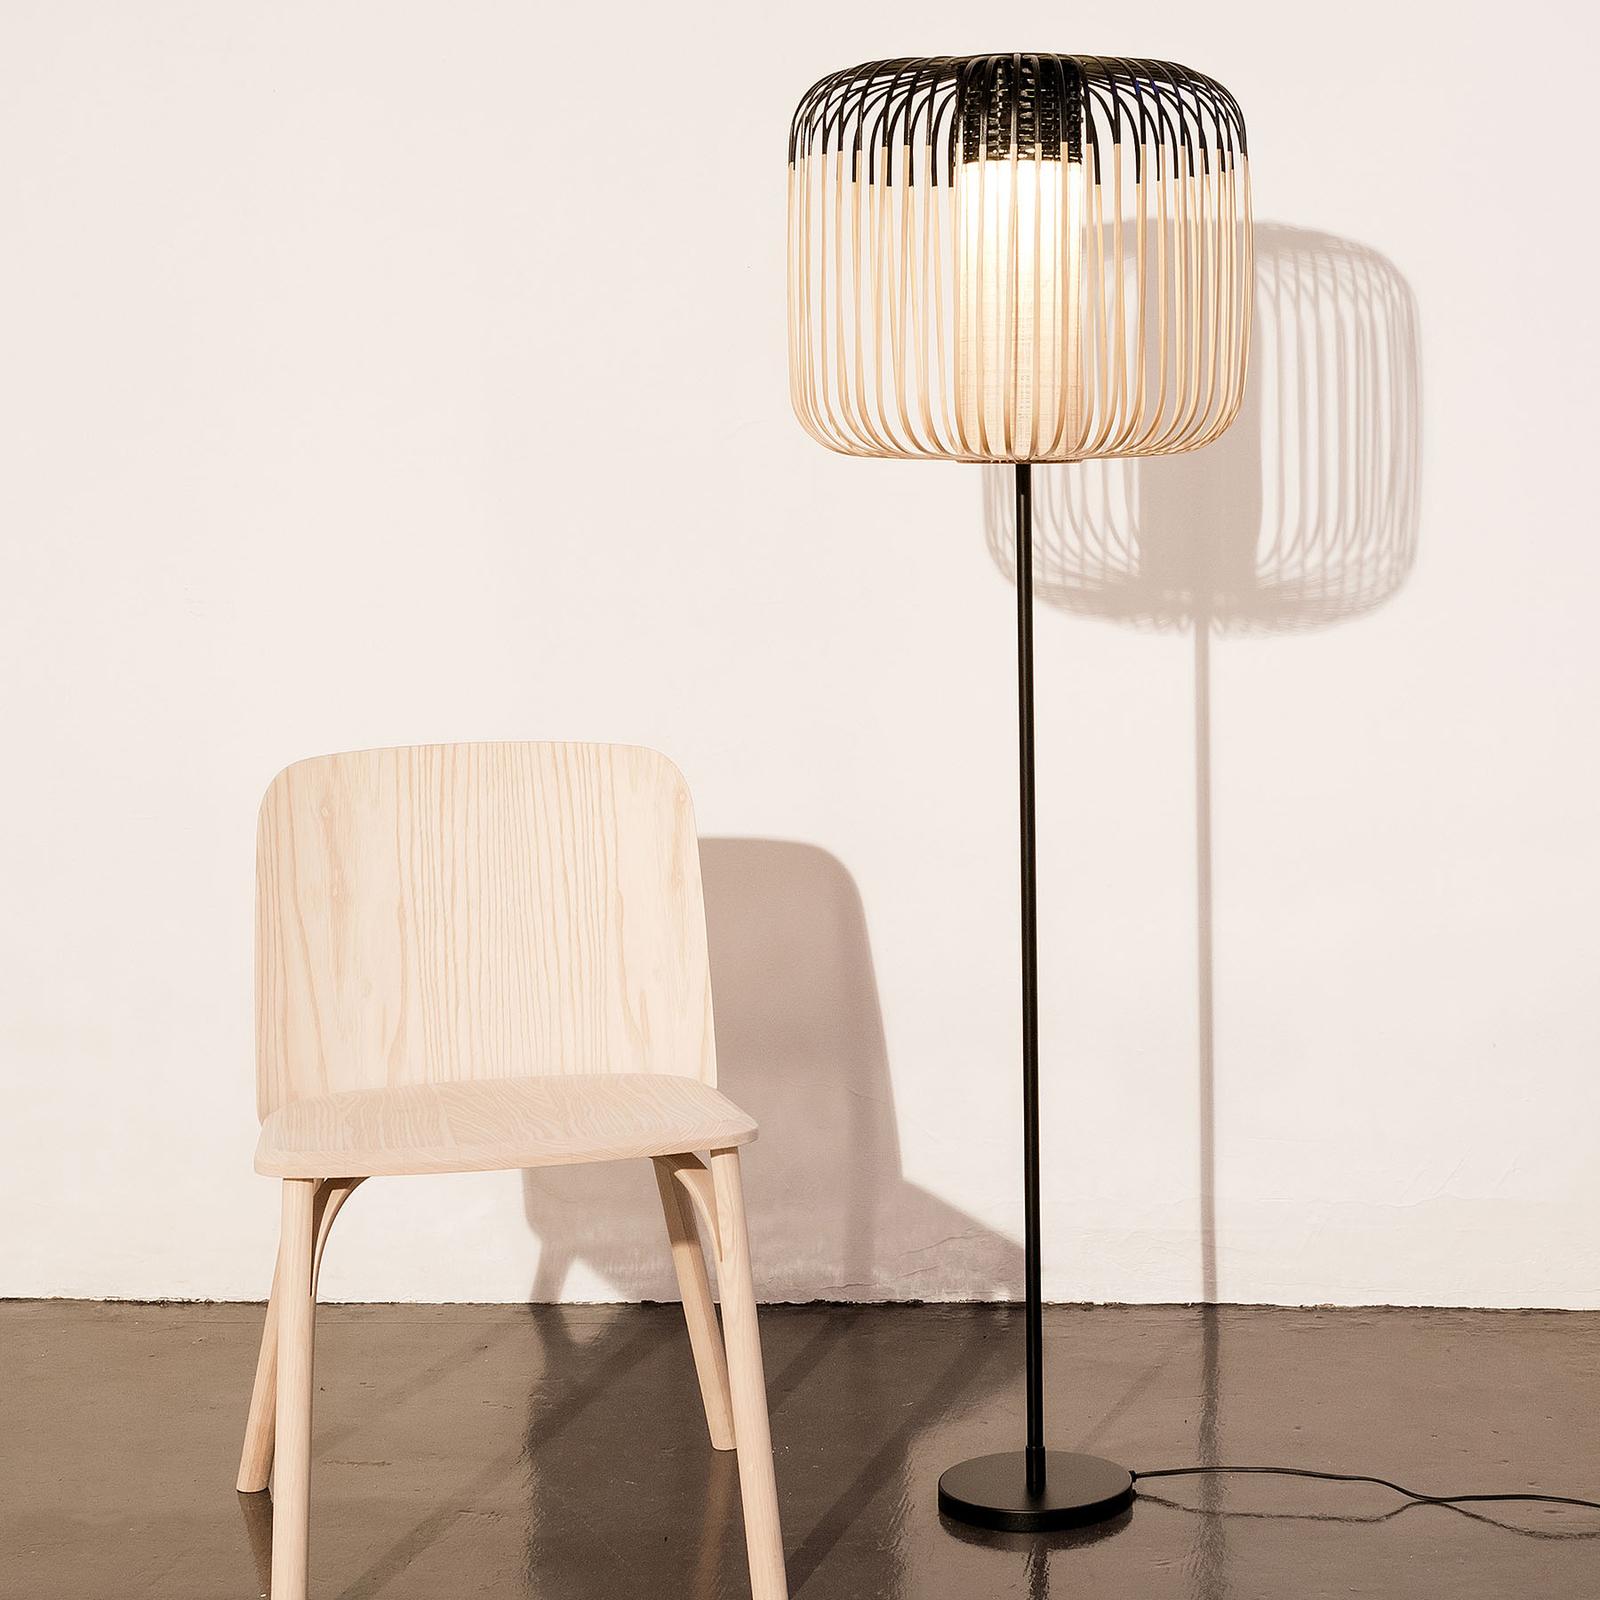 Forestier Bamboo Light floor lamp one-bulb_3567085_1